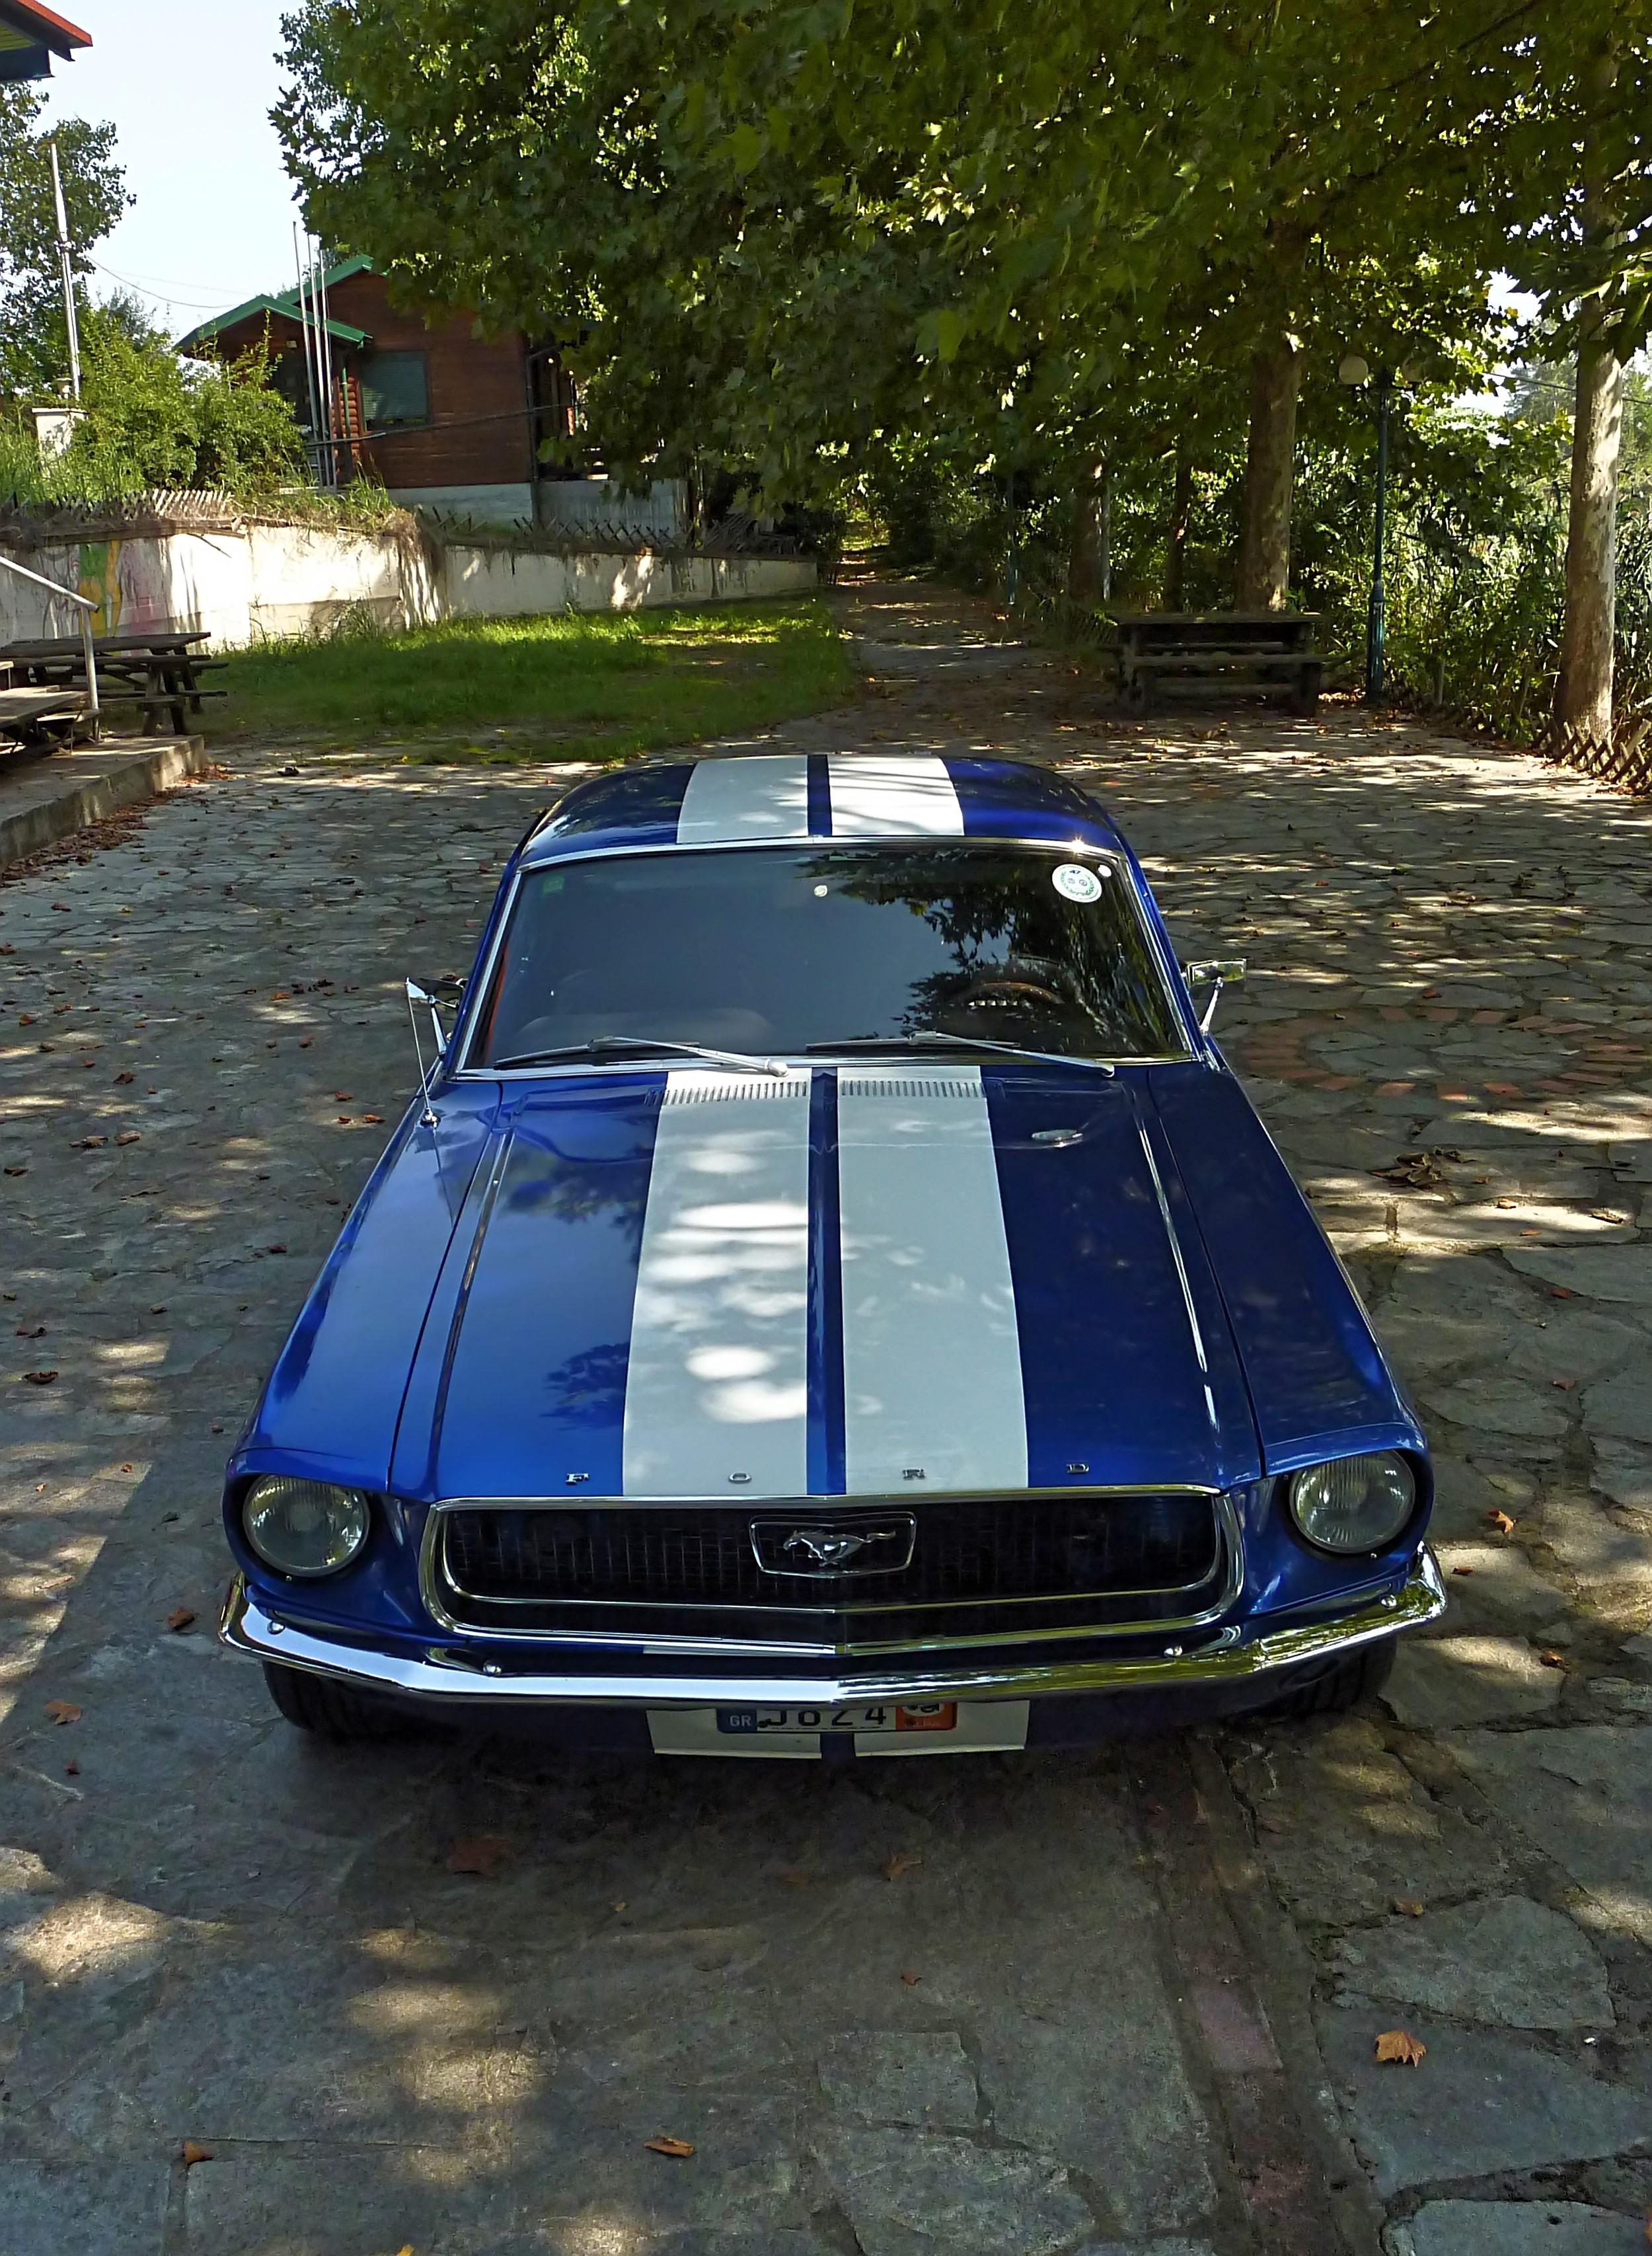 1968 Ford Mustang 289 (62).jpg